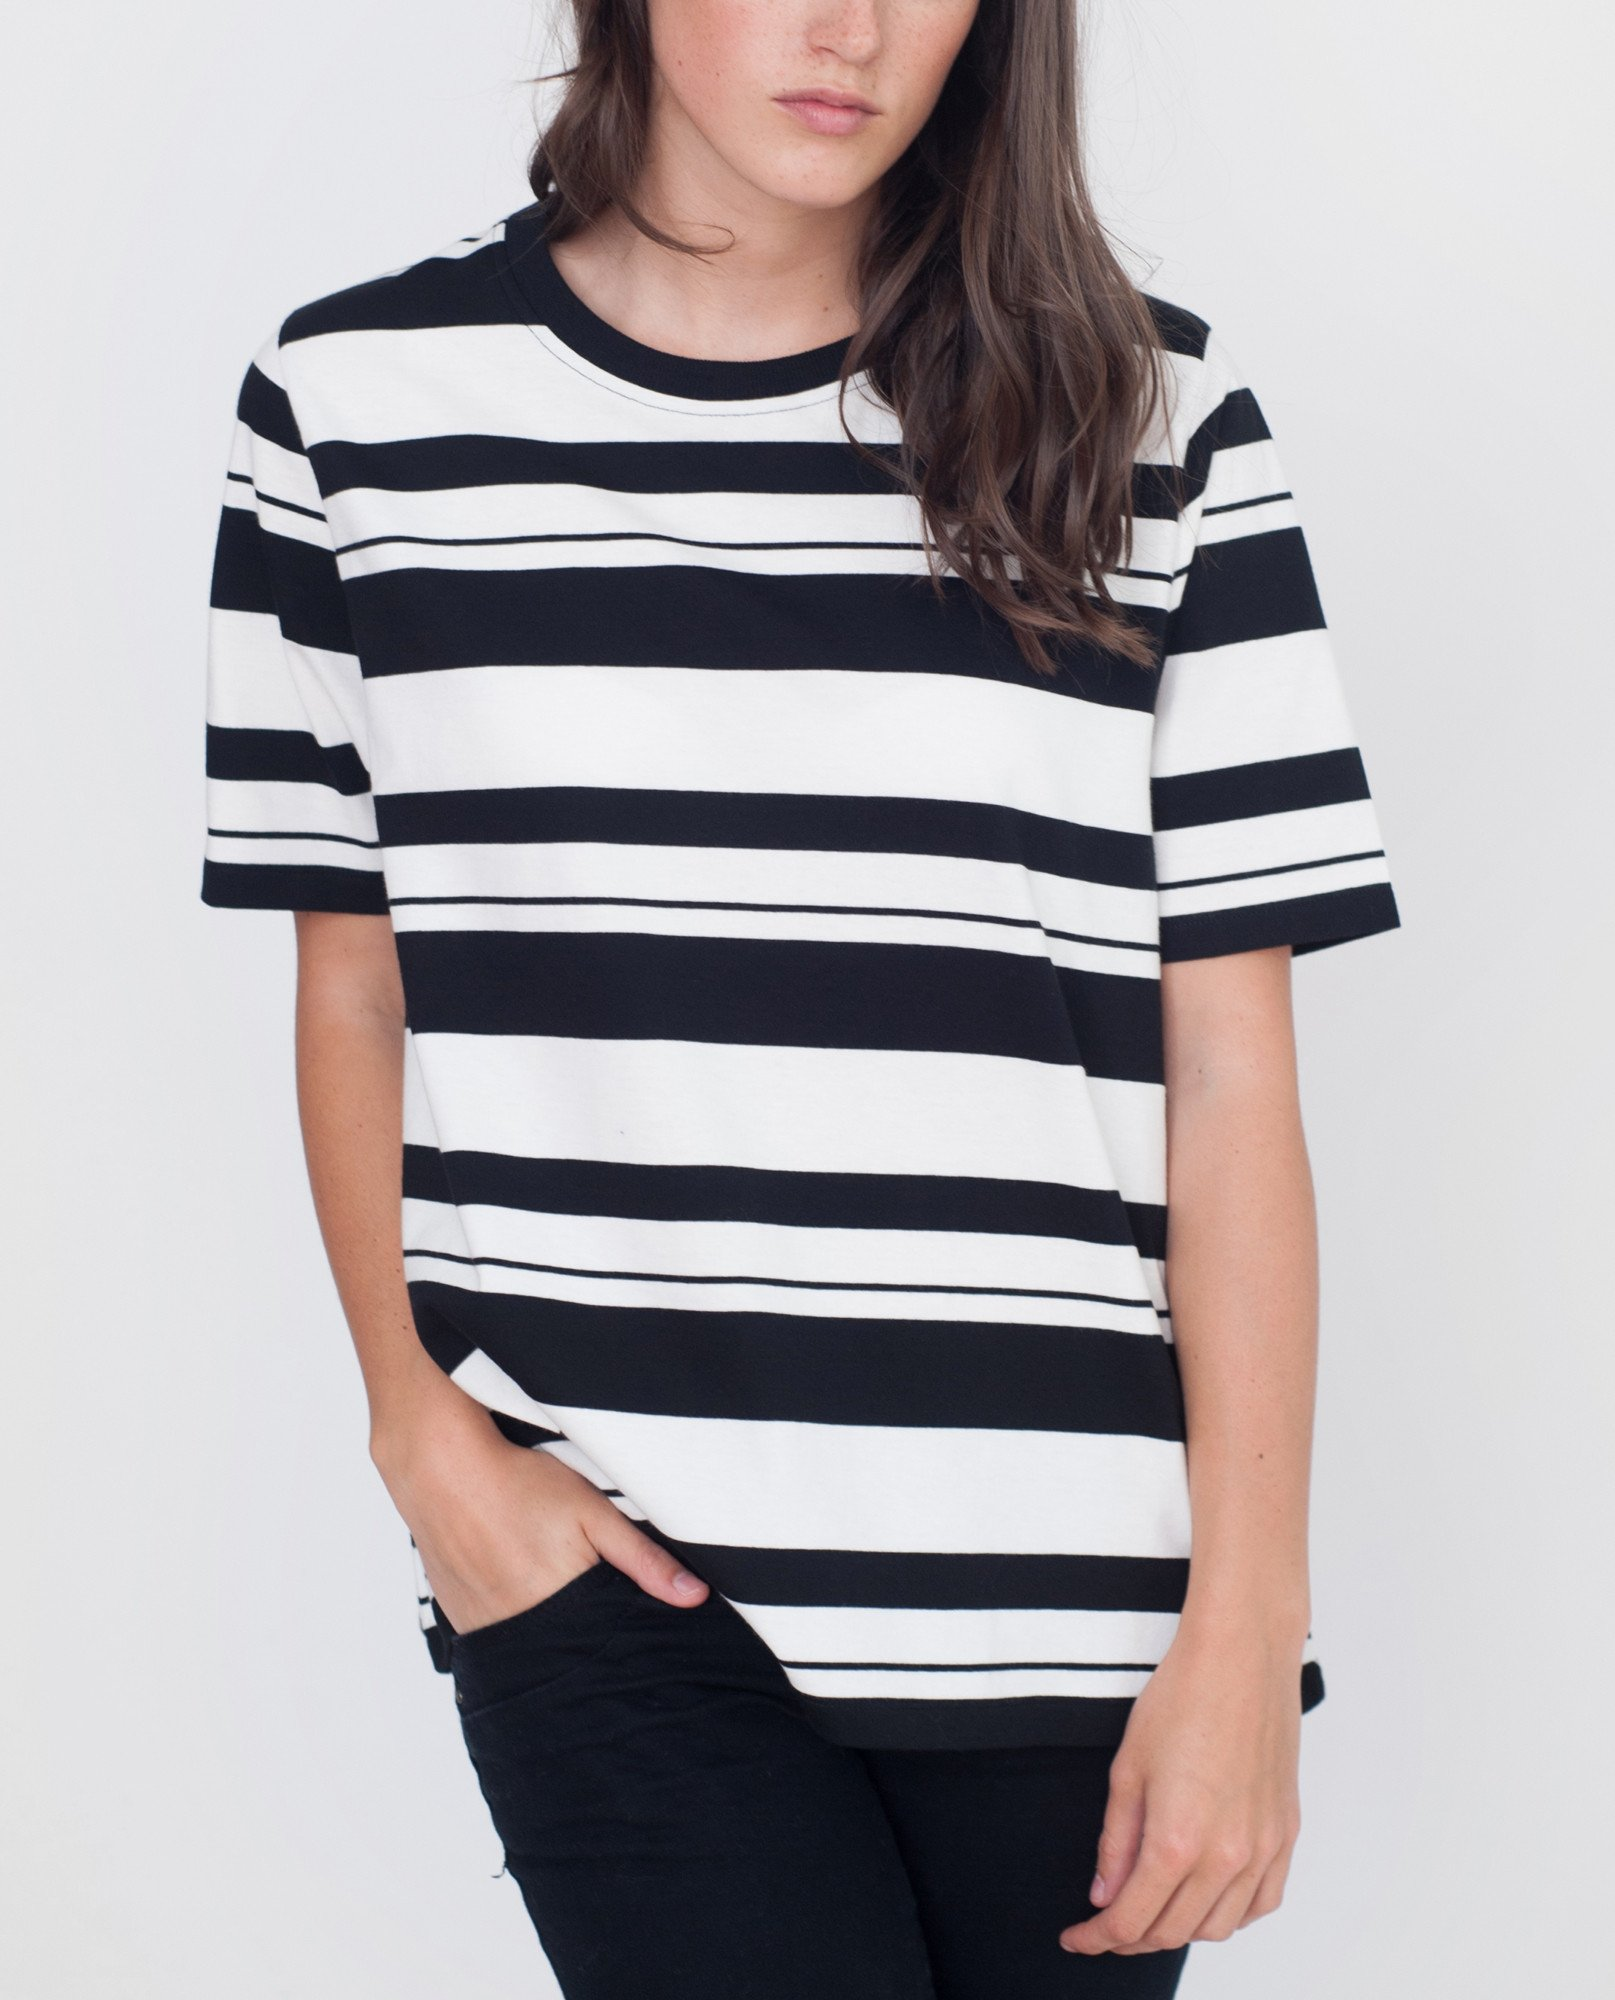 ANNIE Organic Cotton Striped Tshirt from Beaumont Organic